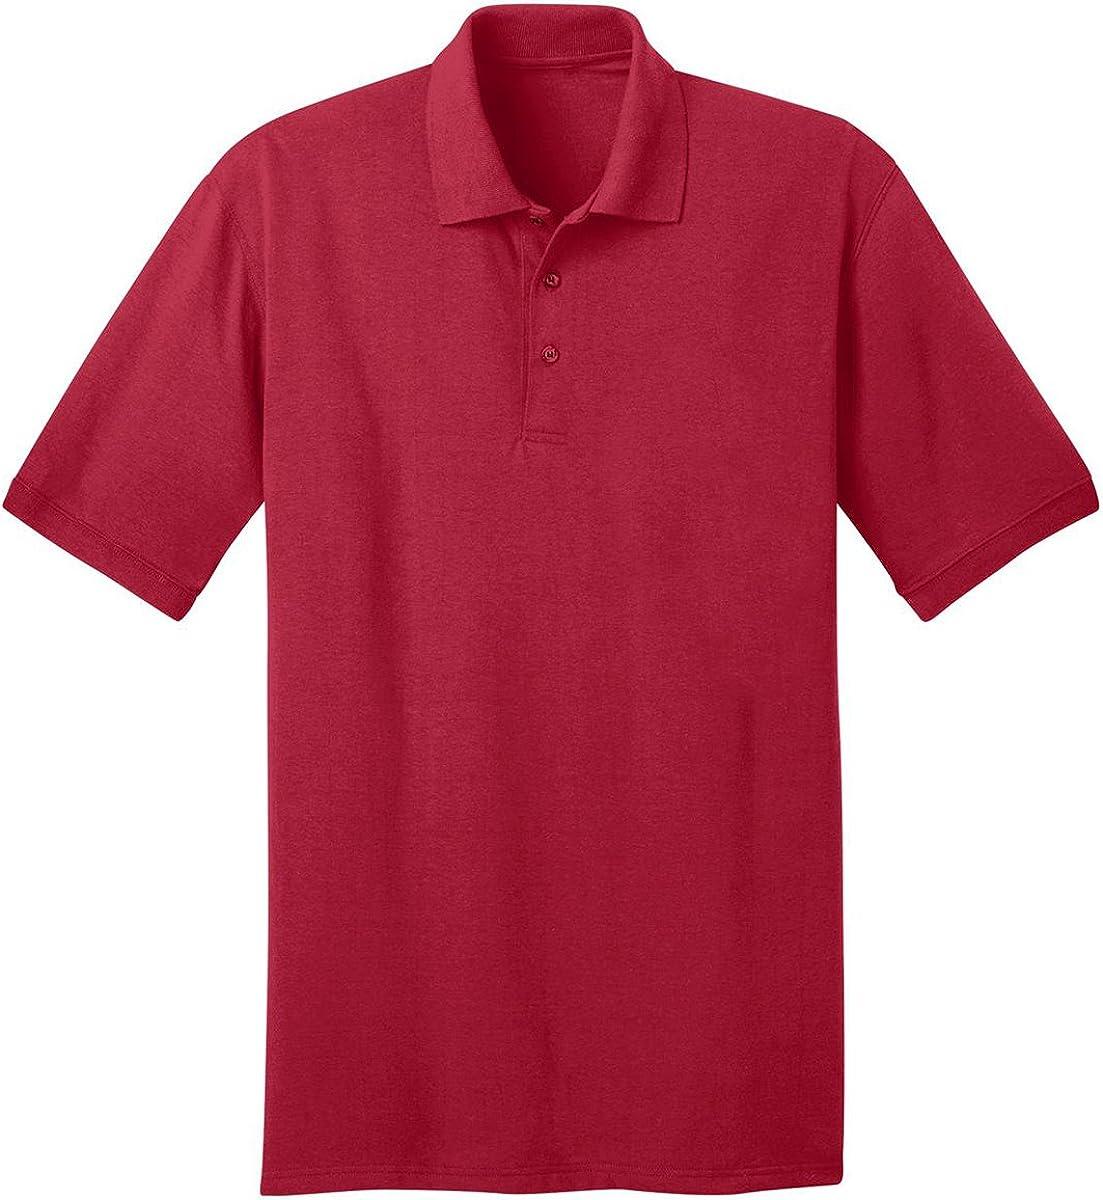 Port /& Comapany Mens Big and Tall Knit Polo Jersey